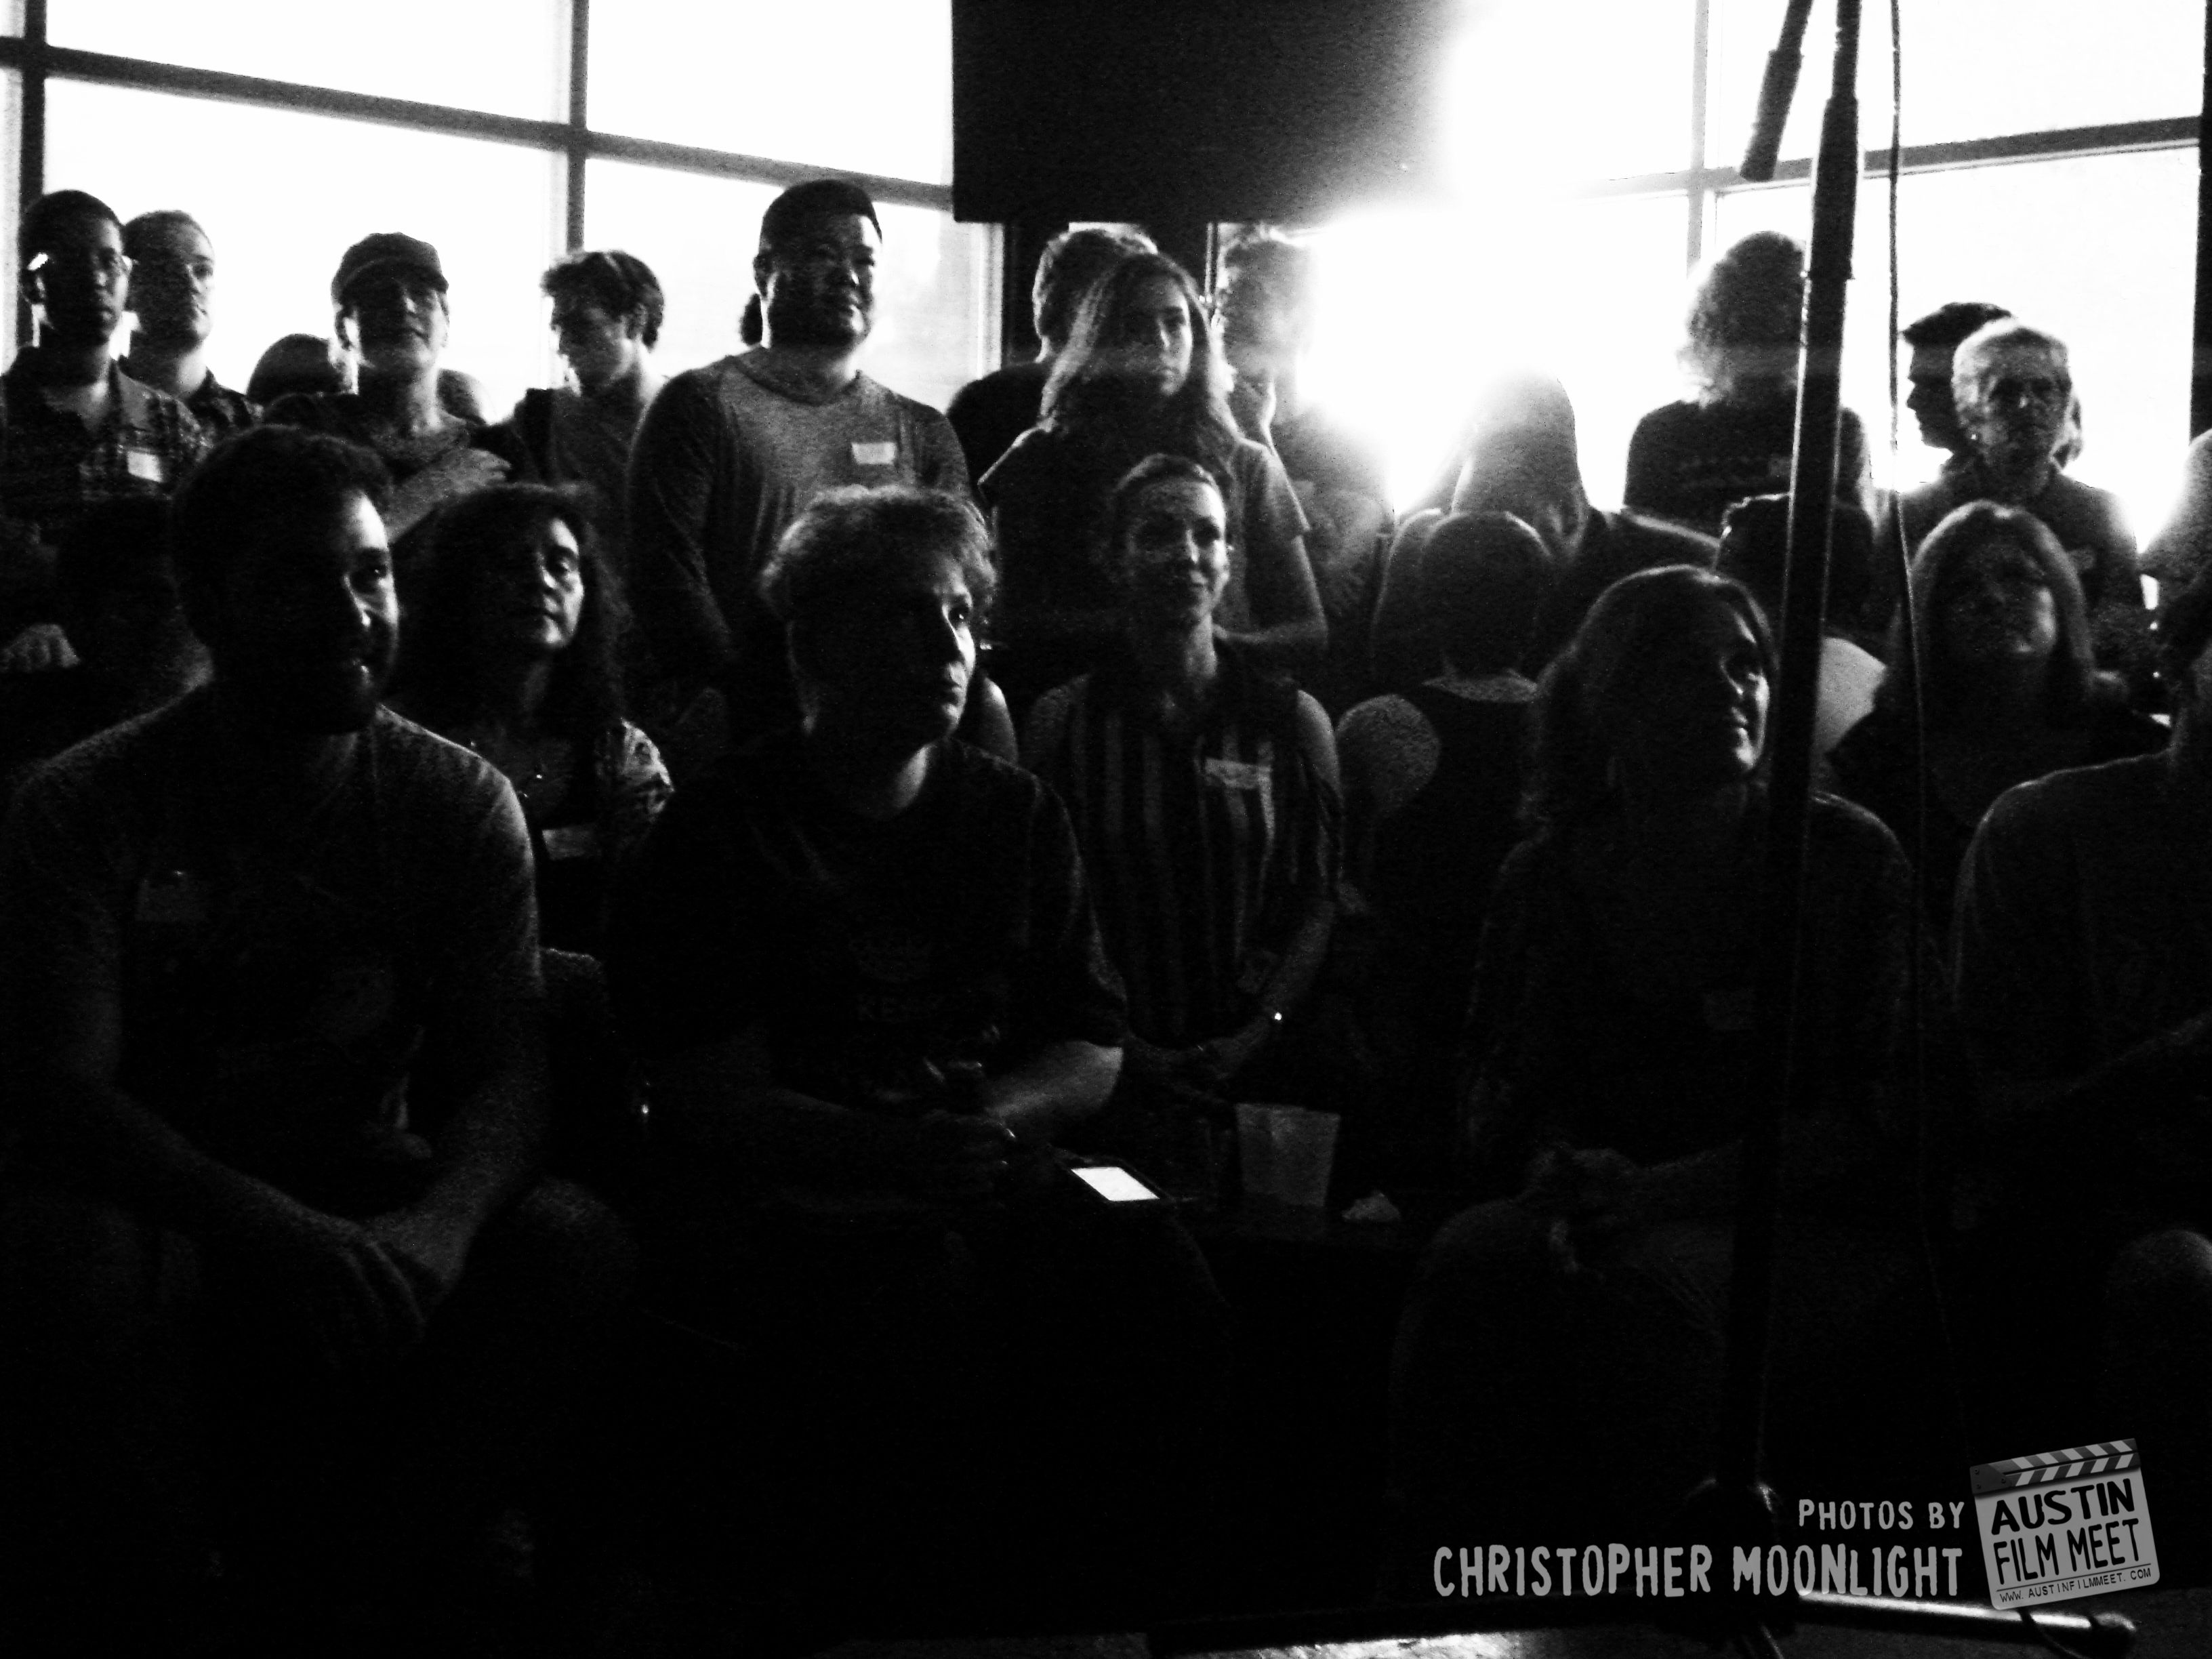 Photos from Austin Film Meet Mixer July 2014 by Christopher Moonlight